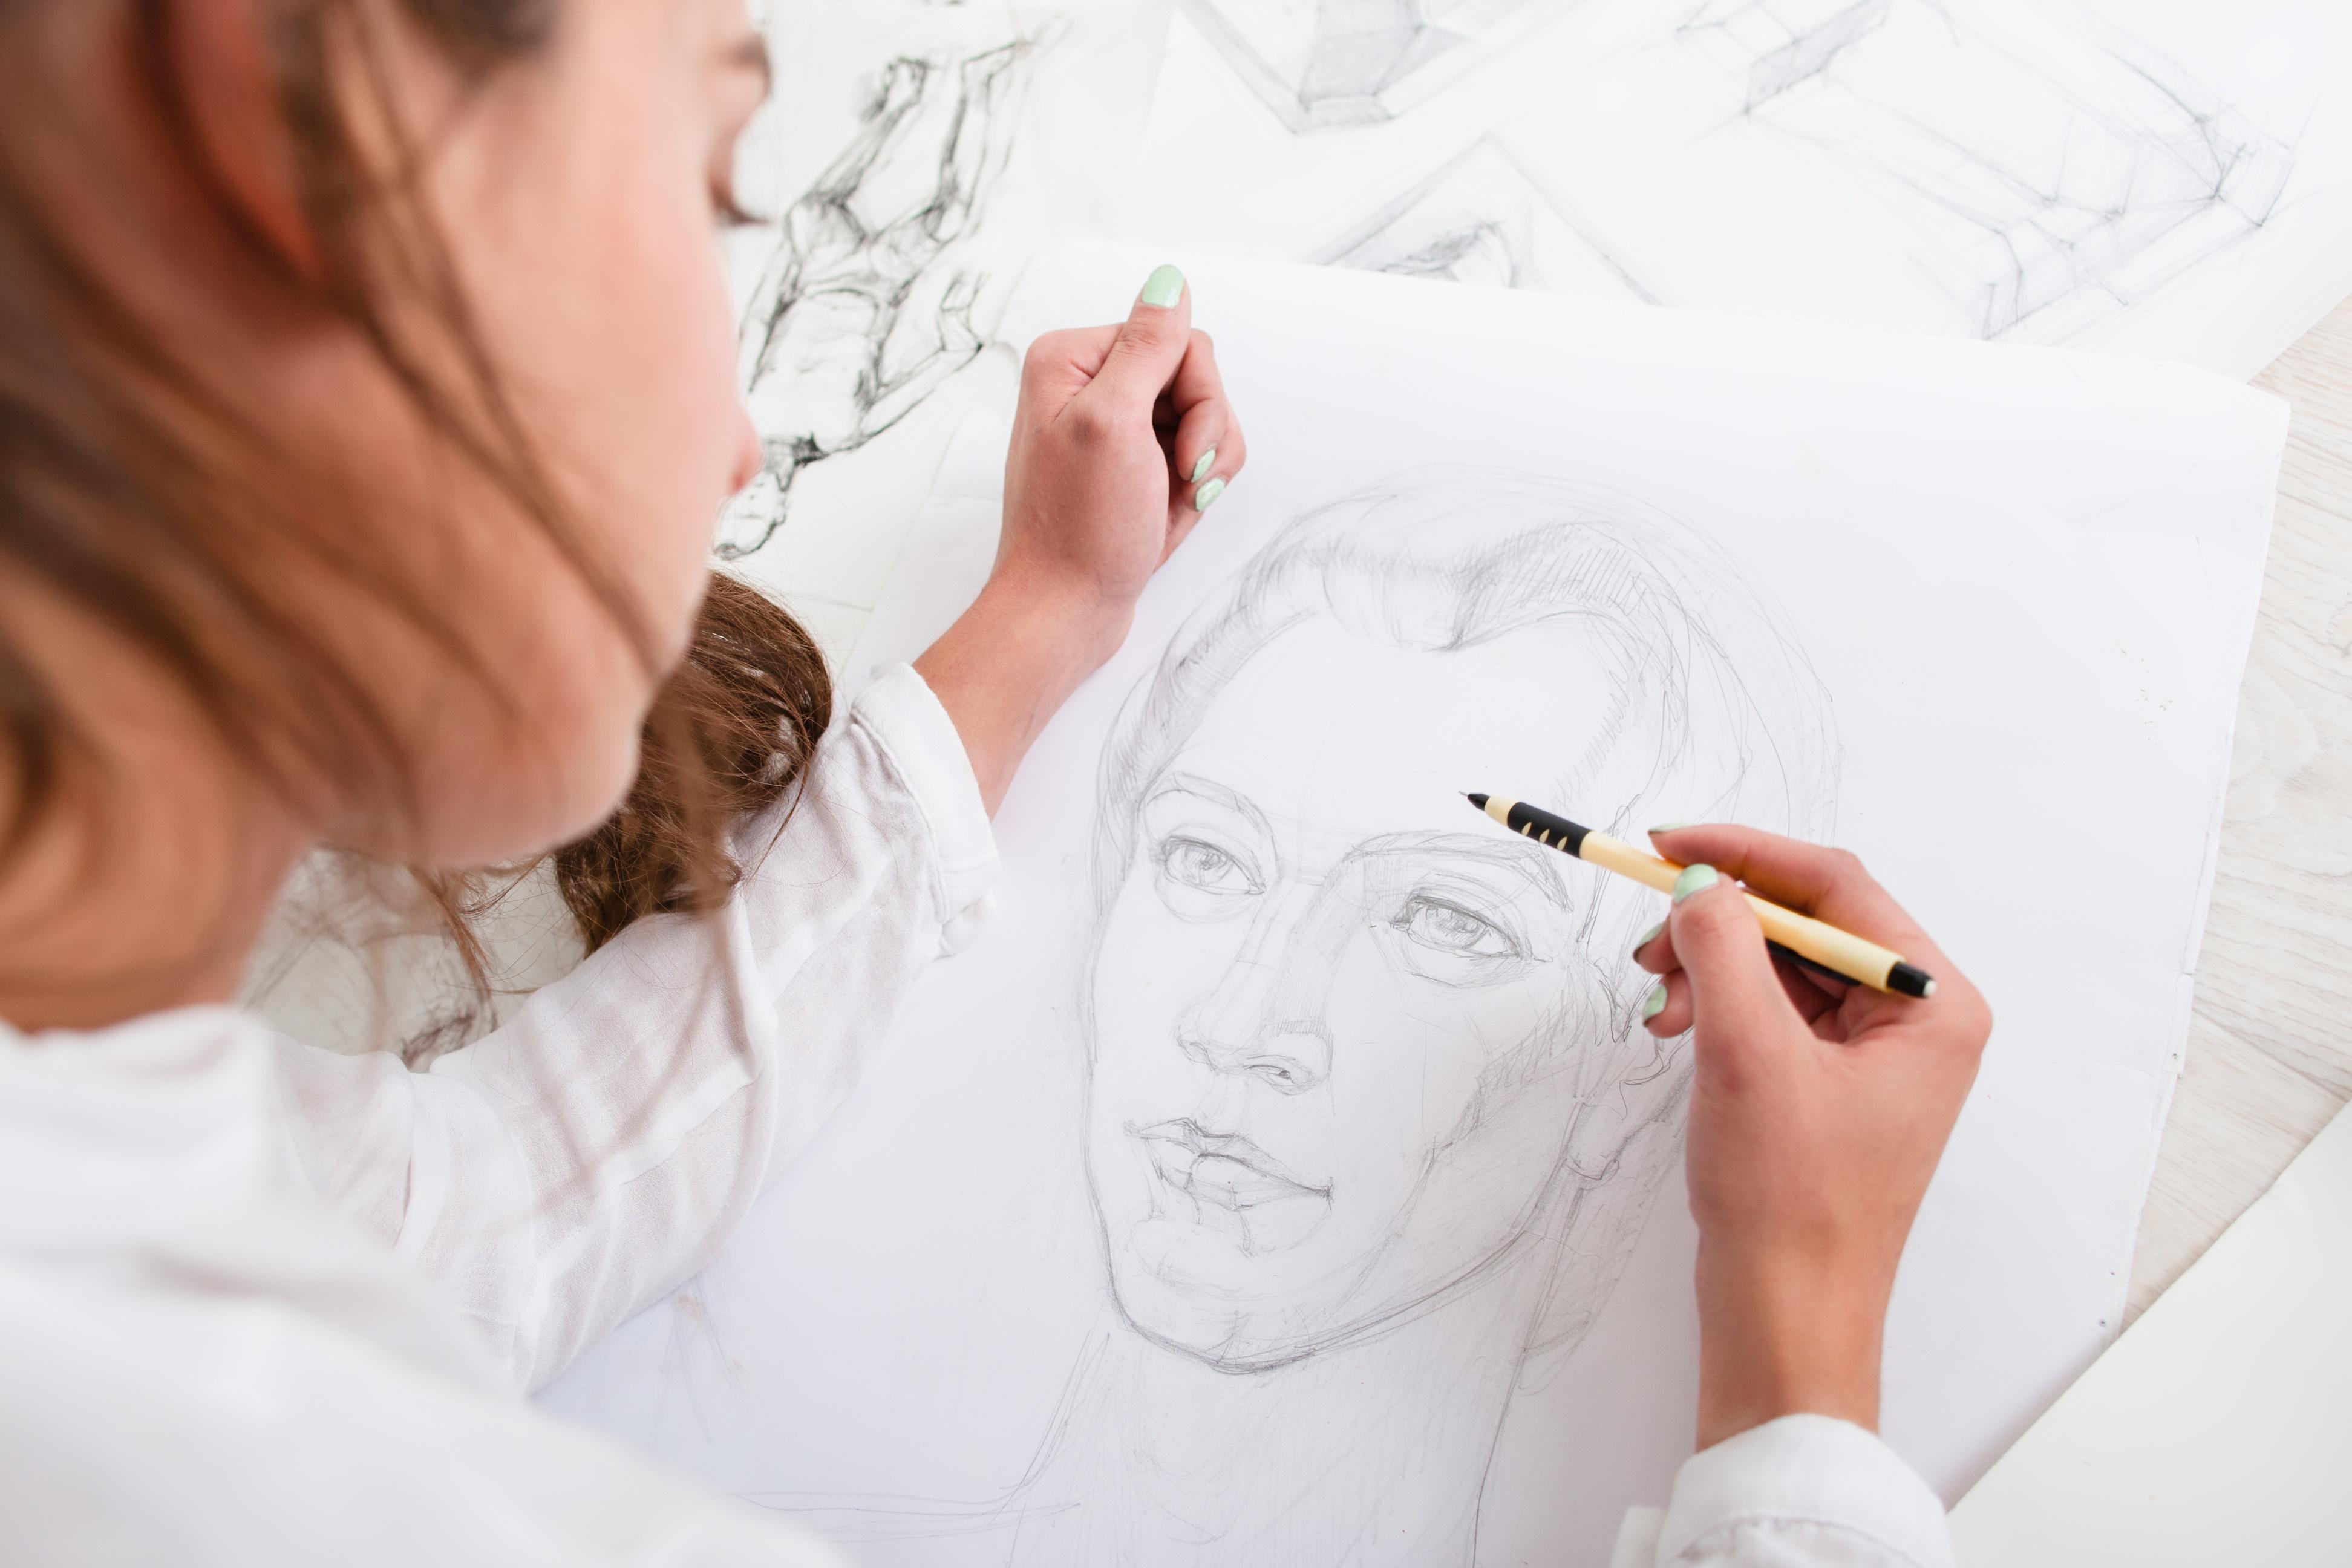 Artist drawing pencil portrait close-up